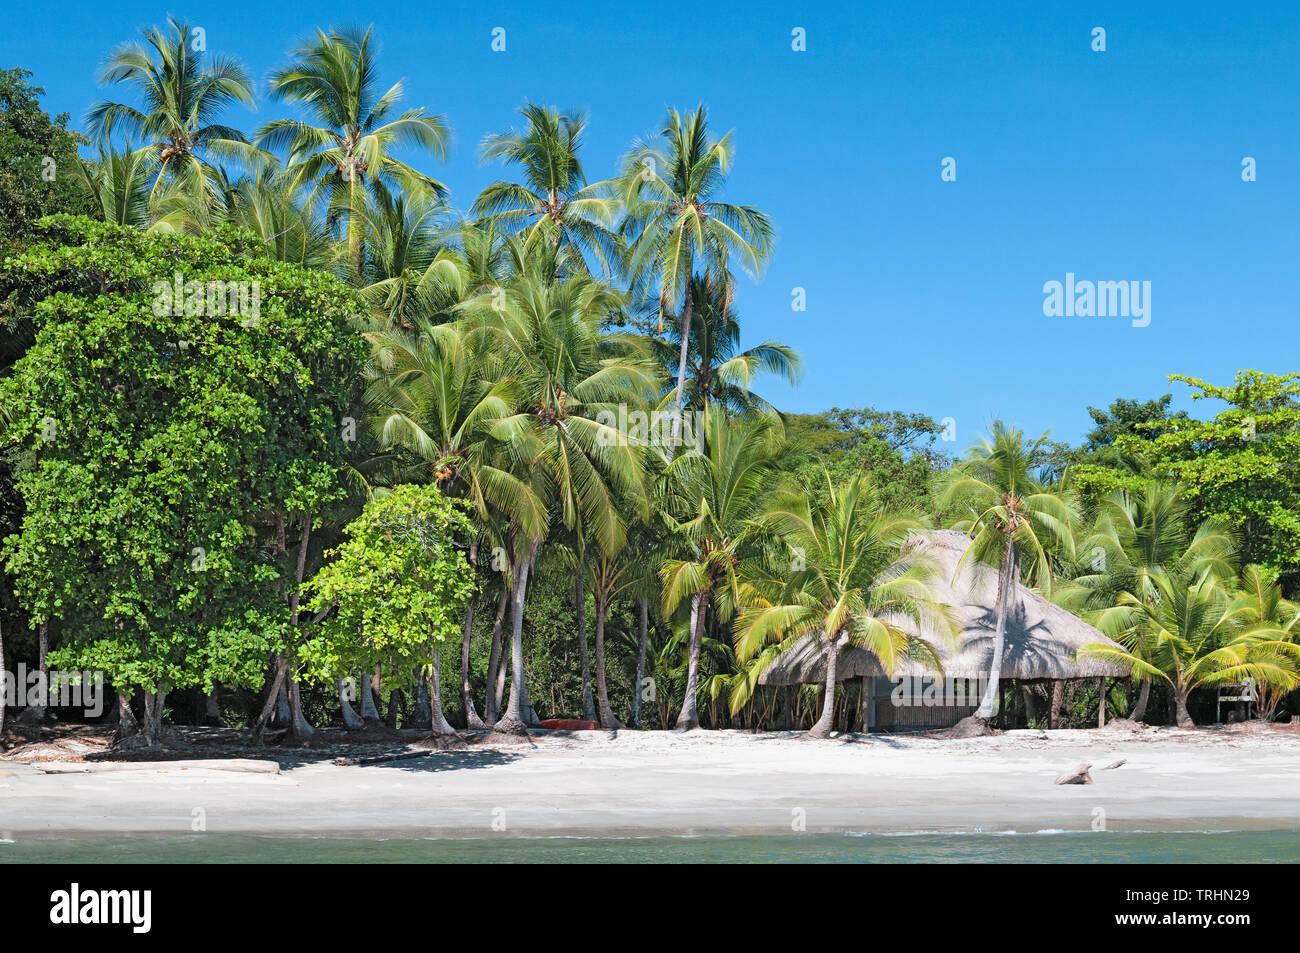 Bellissima isola tropicale paesaggio in Chiriqui, Panama. Immagini Stock